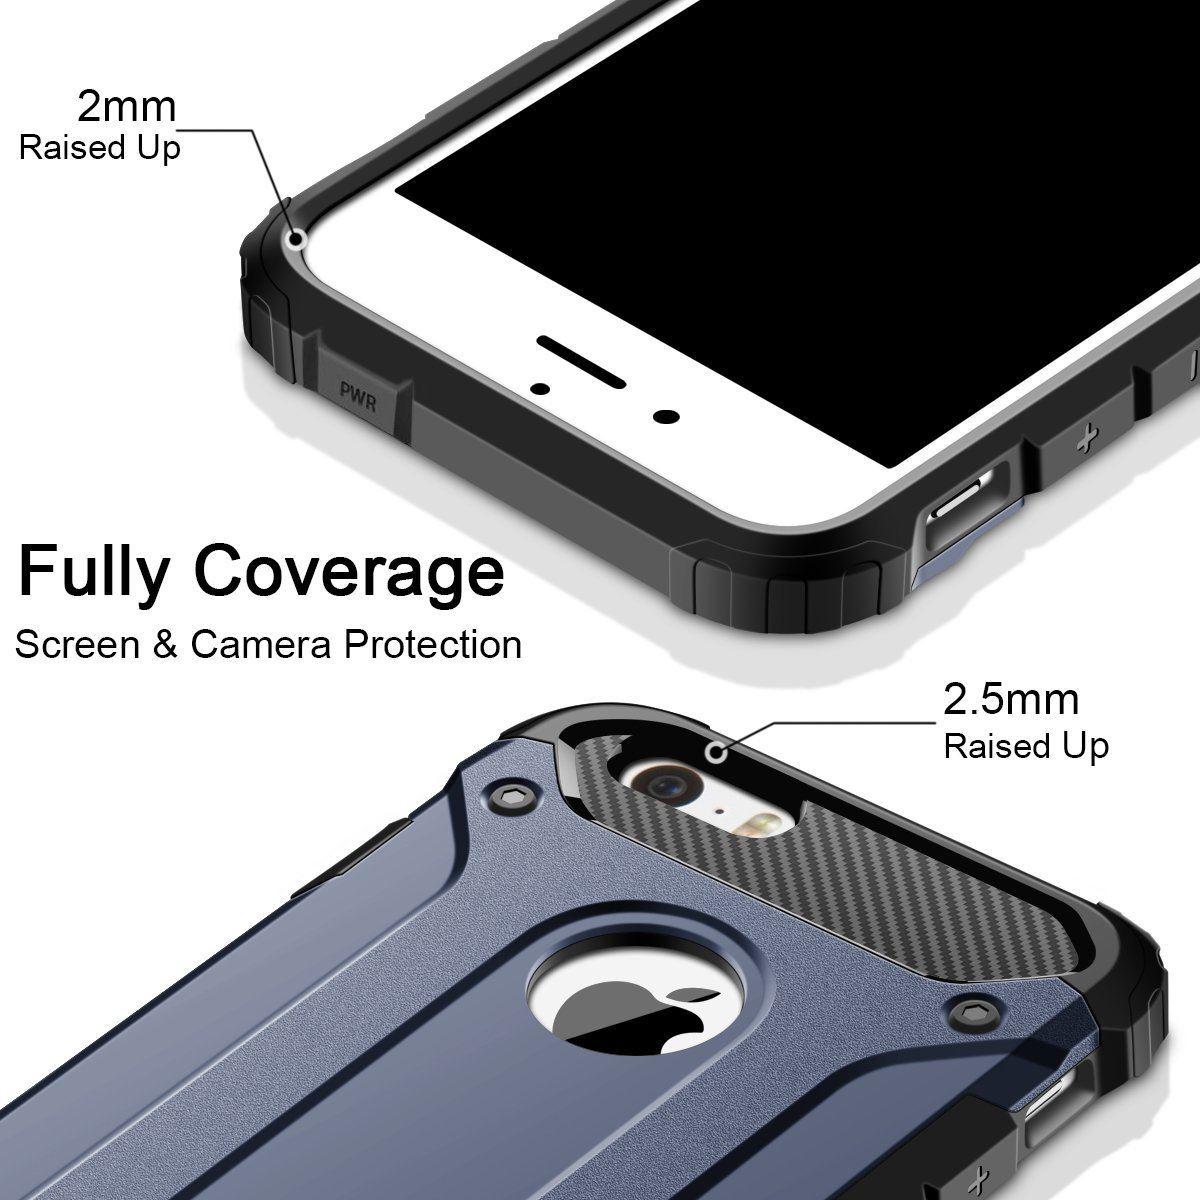 thumbnail 14 - For Apple iPhone 11 Pro Max XR Xs X 8 7 Plus 6 5 Se Case Cover Tough Armor